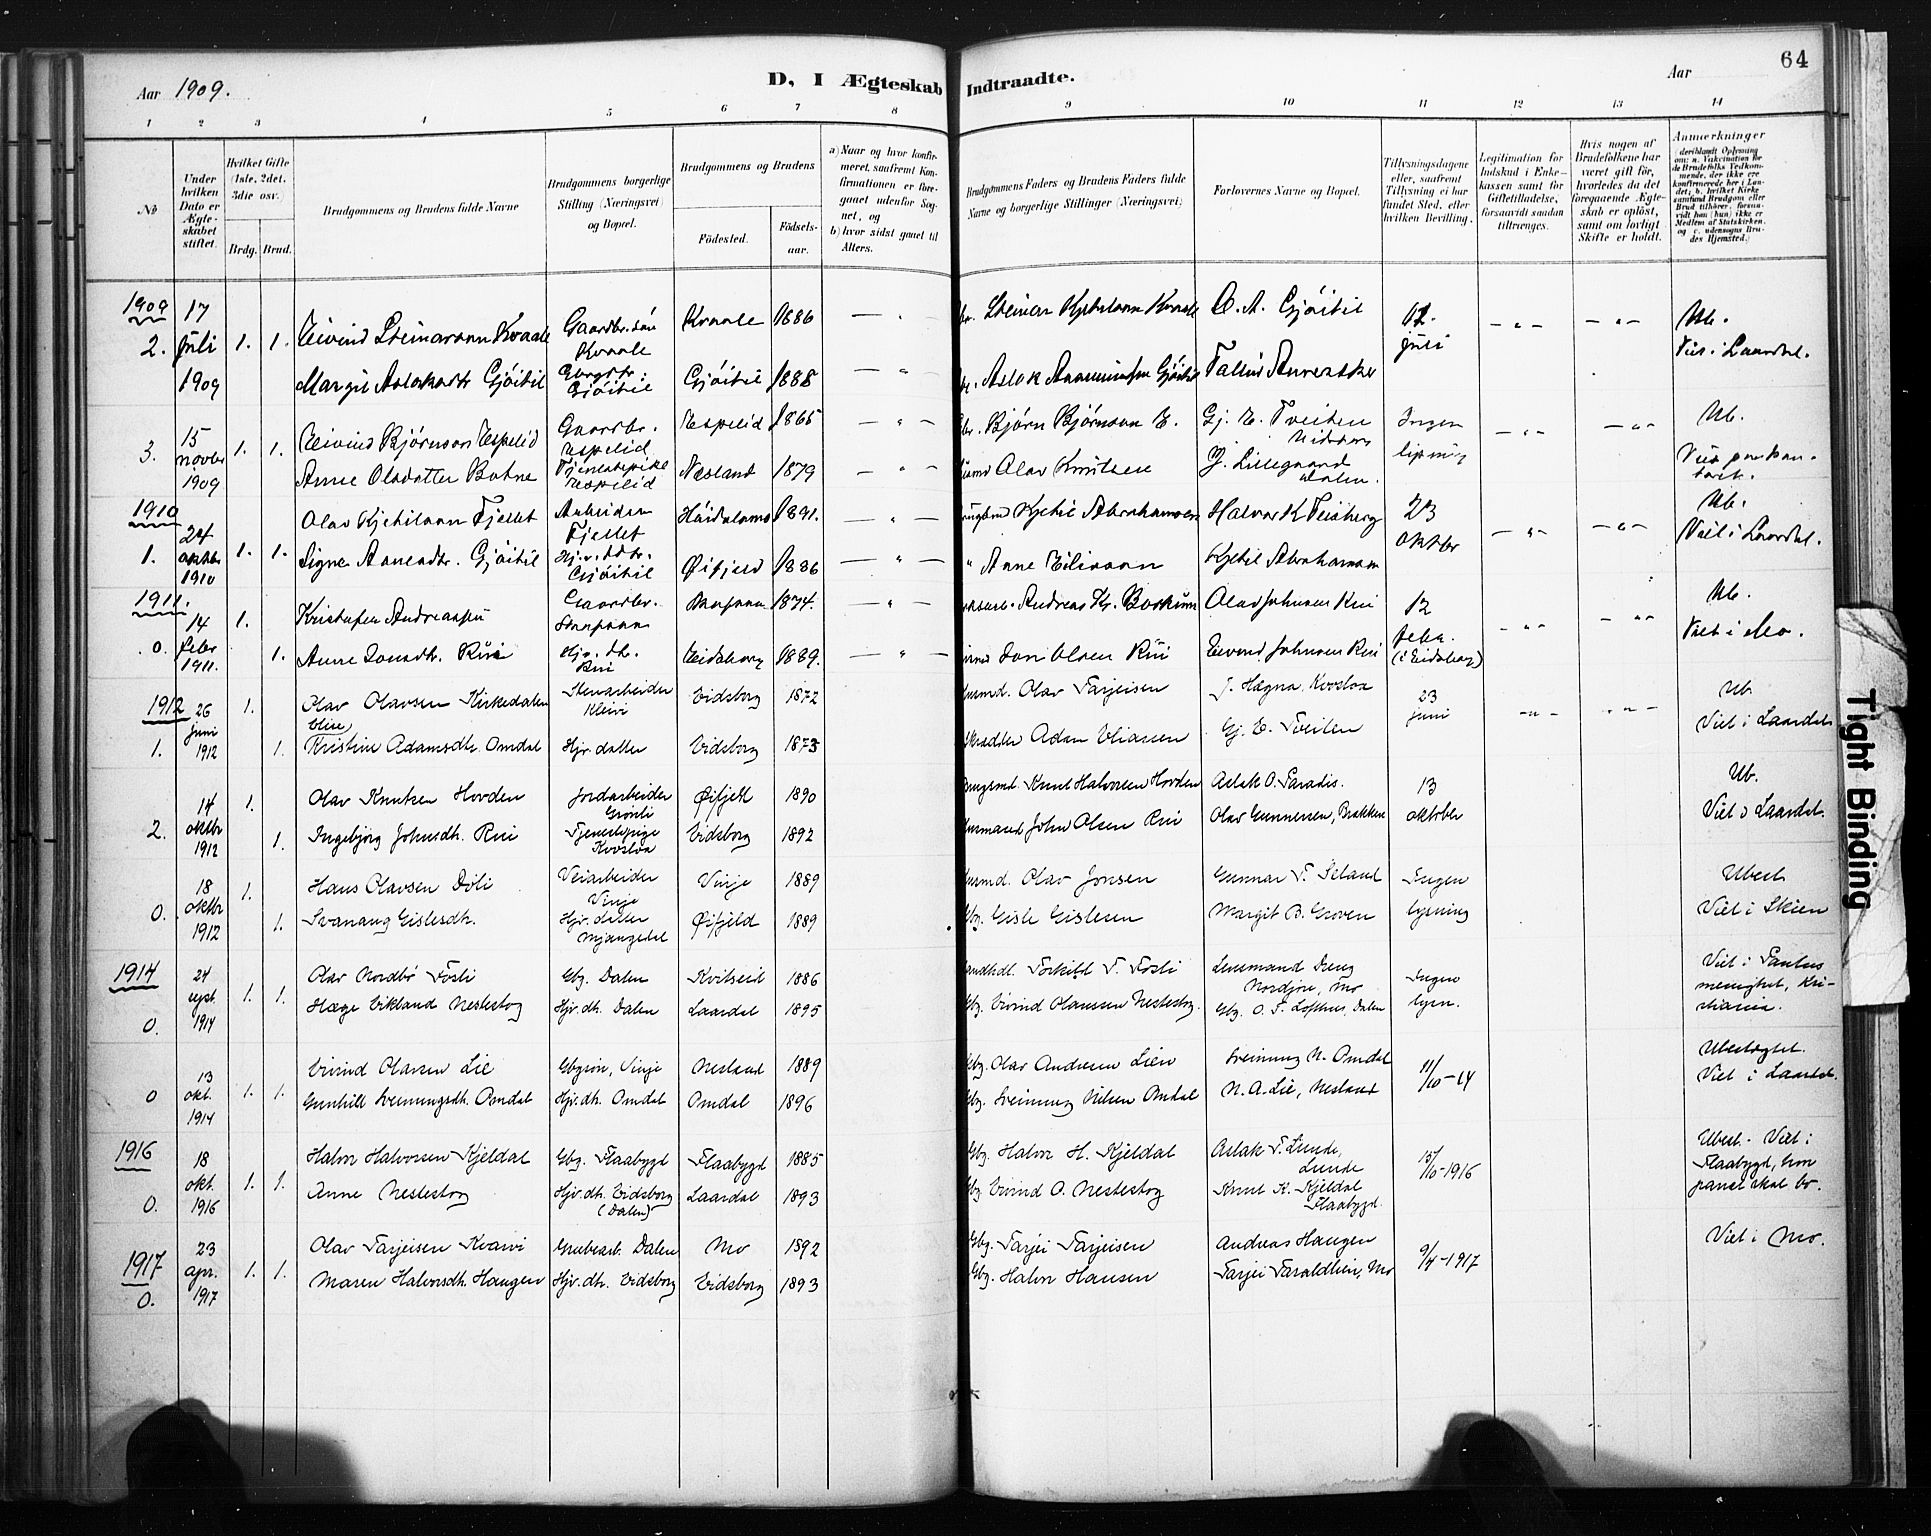 SAKO, Lårdal kirkebøker, F/Fb/L0002: Ministerialbok nr. II 2, 1887-1918, s. 64